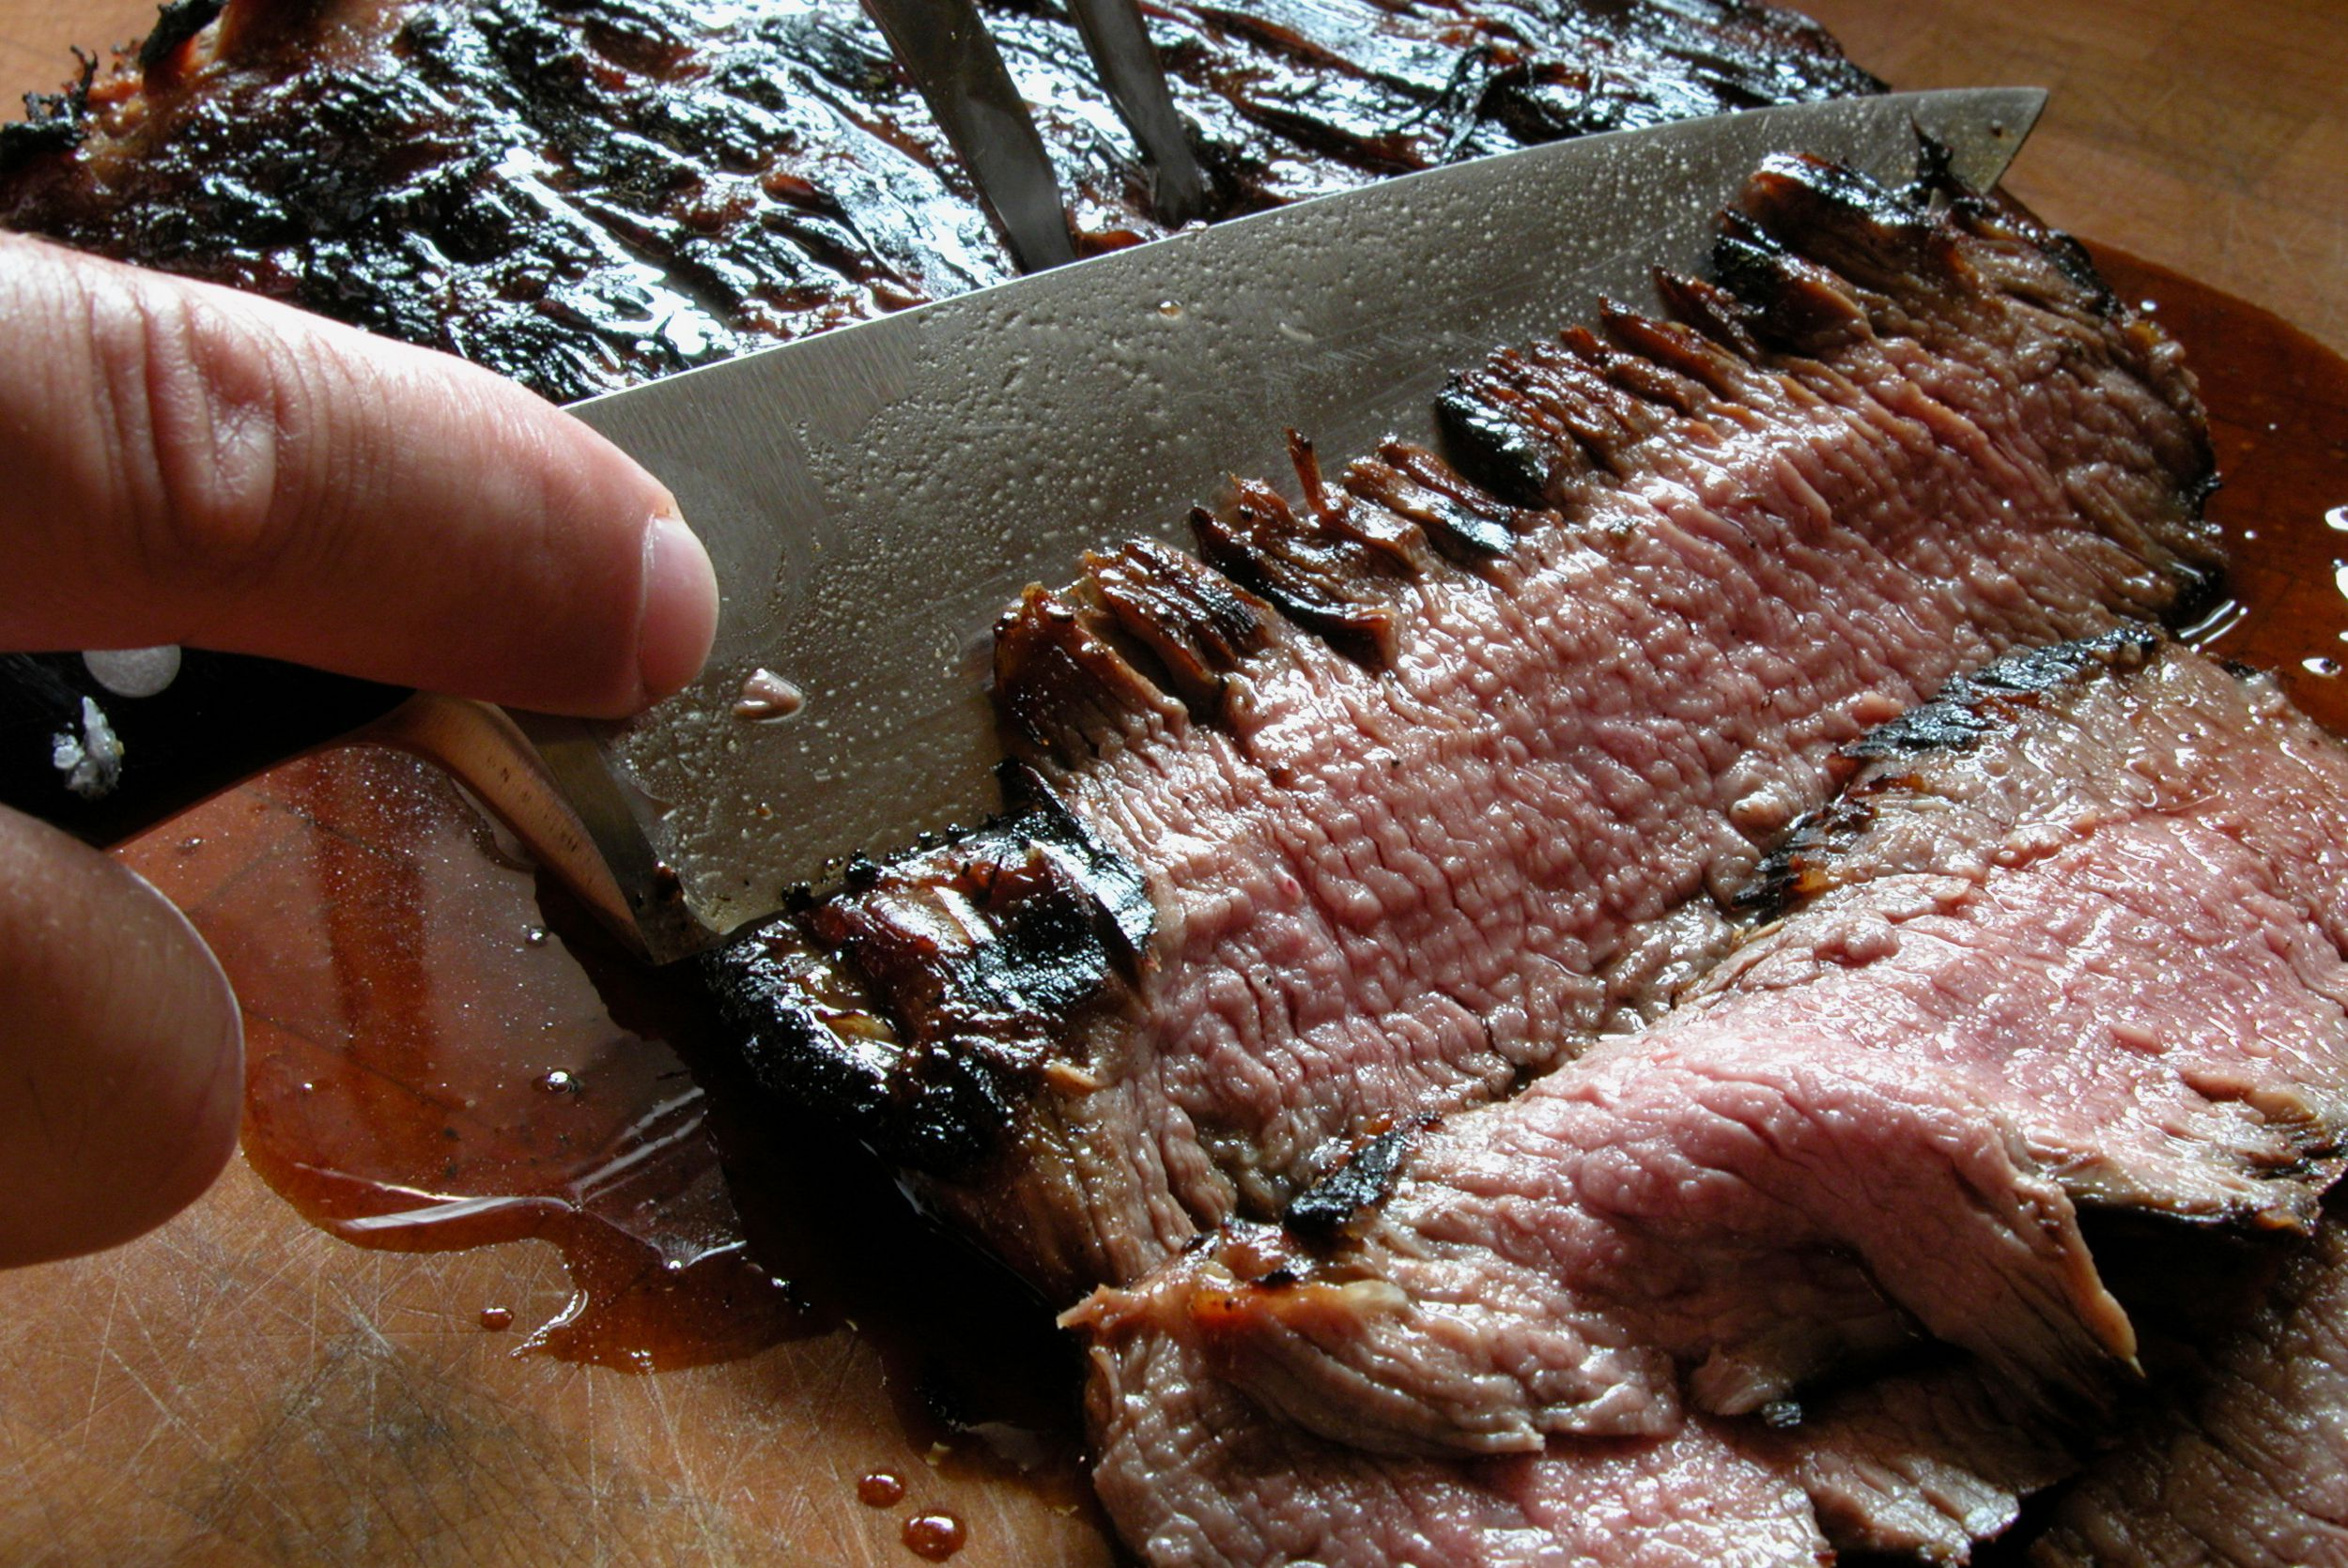 Slicing flank steak against the grain